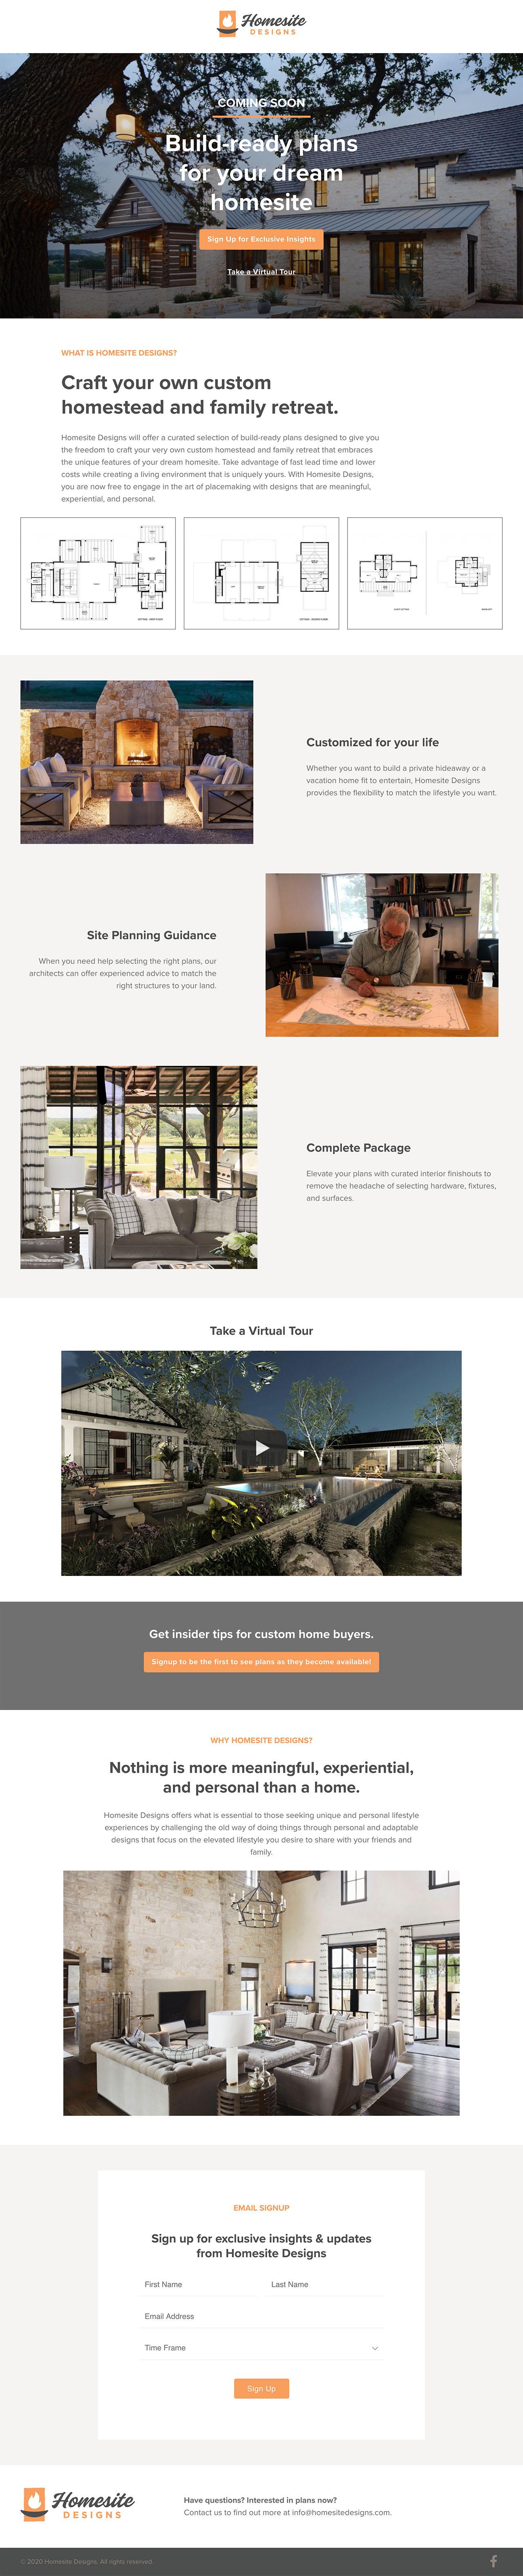 homesitedesigns-landingpage-2.jpg